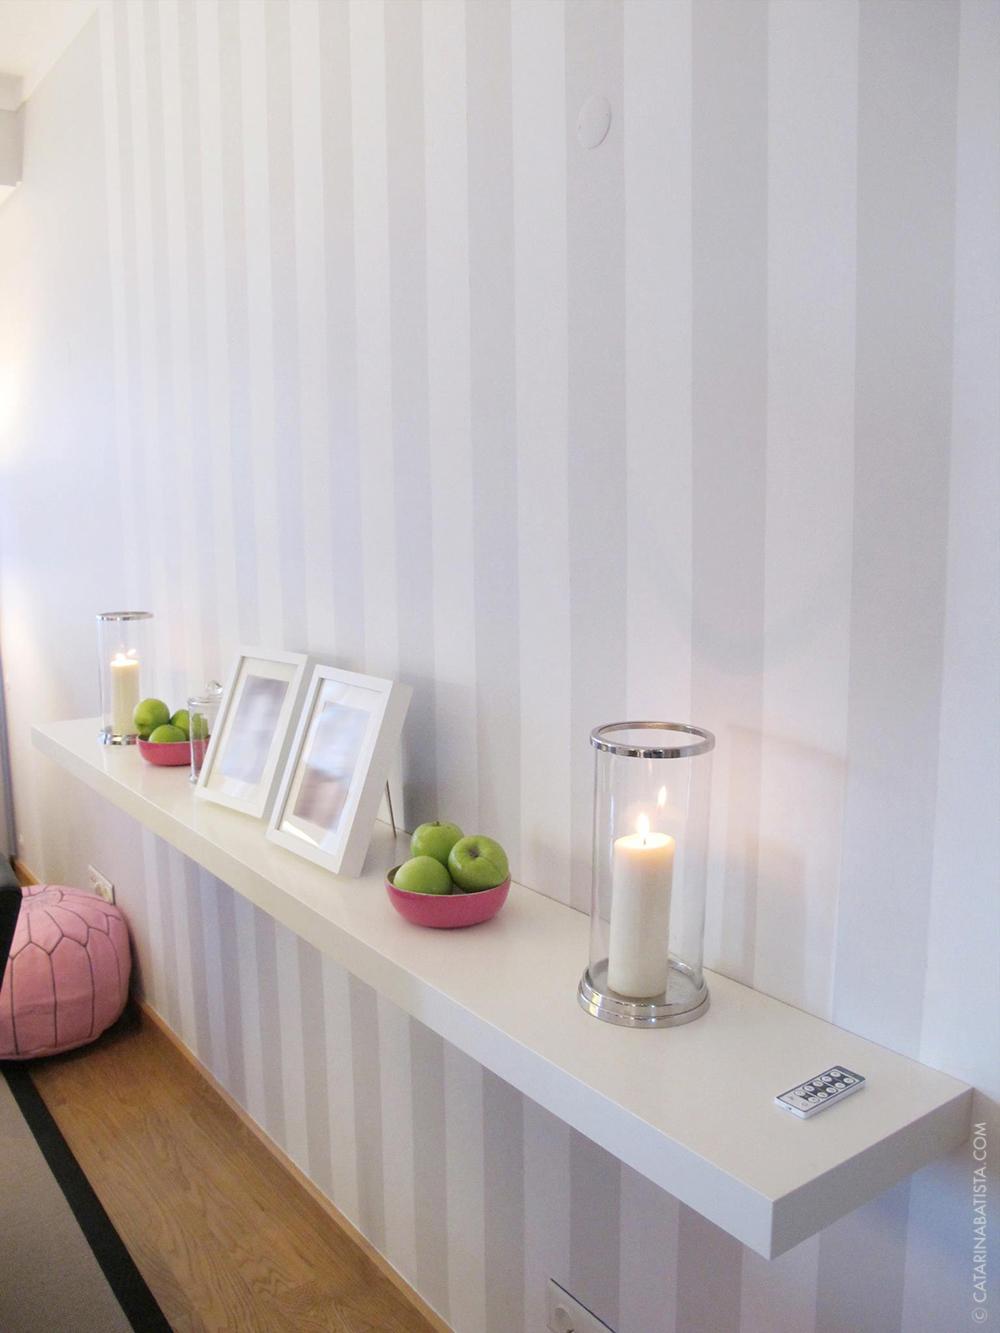 01-catarina-batista-arquitectura-design-interior-apatamento-livingroom-entrecampos-lisboa.jpg